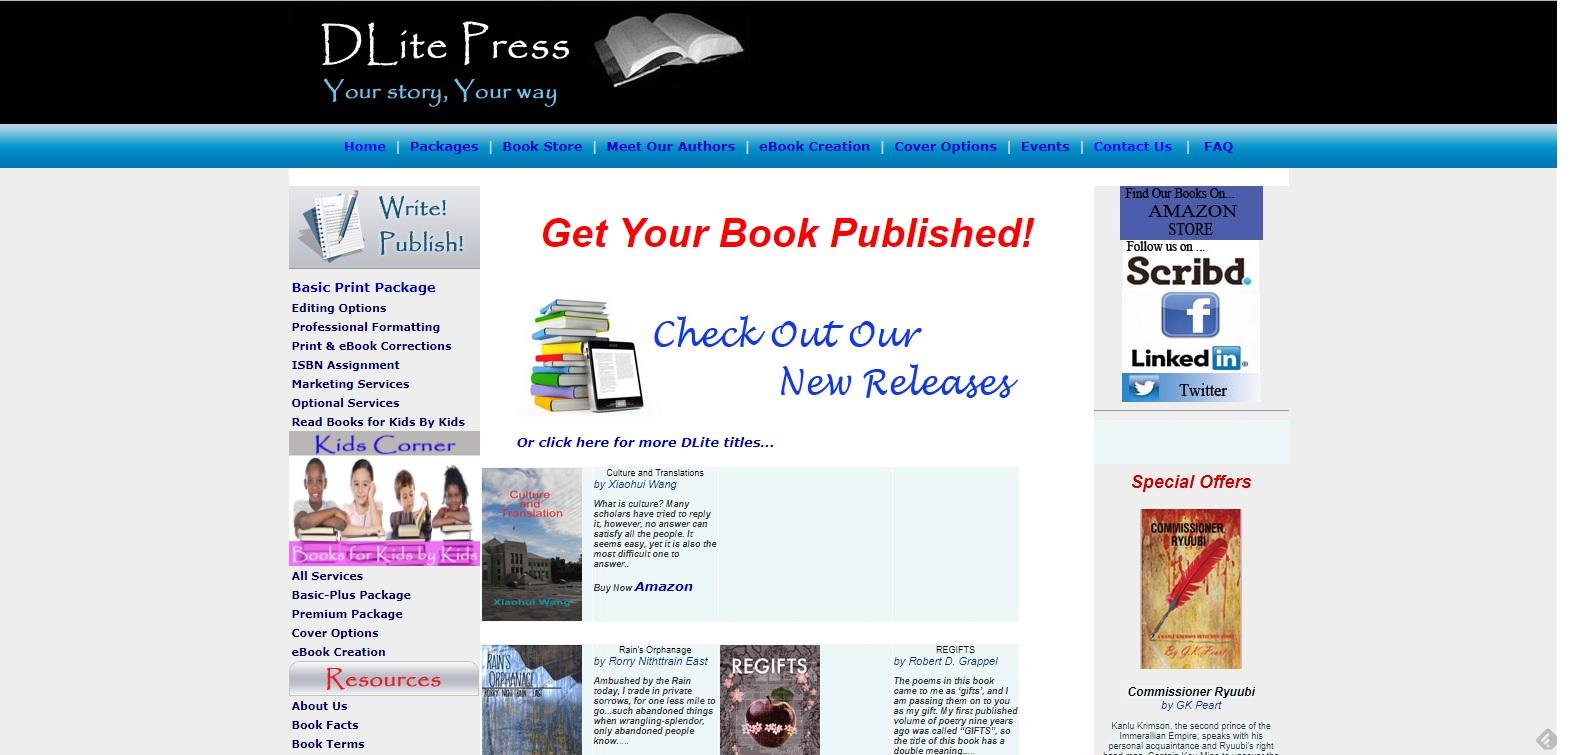 DLite Press